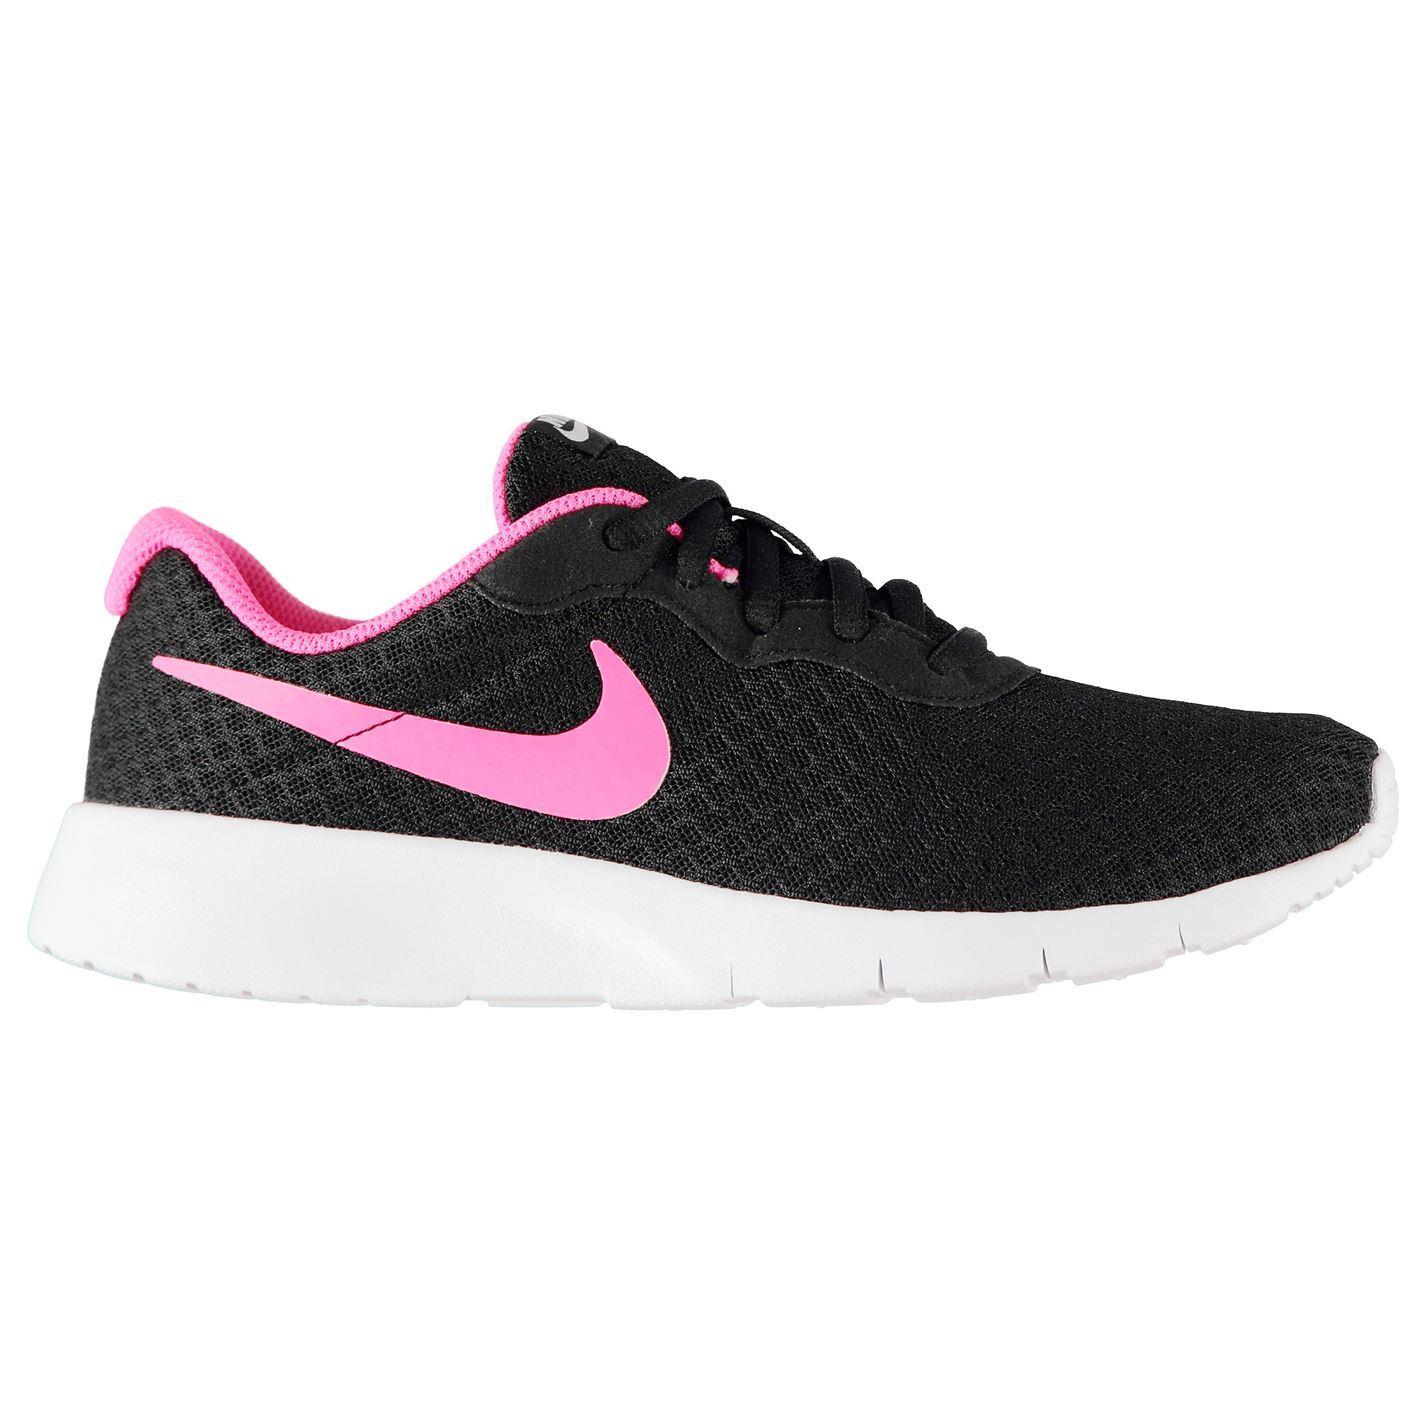 Nike Tanjun Girls Trainers Sneakers